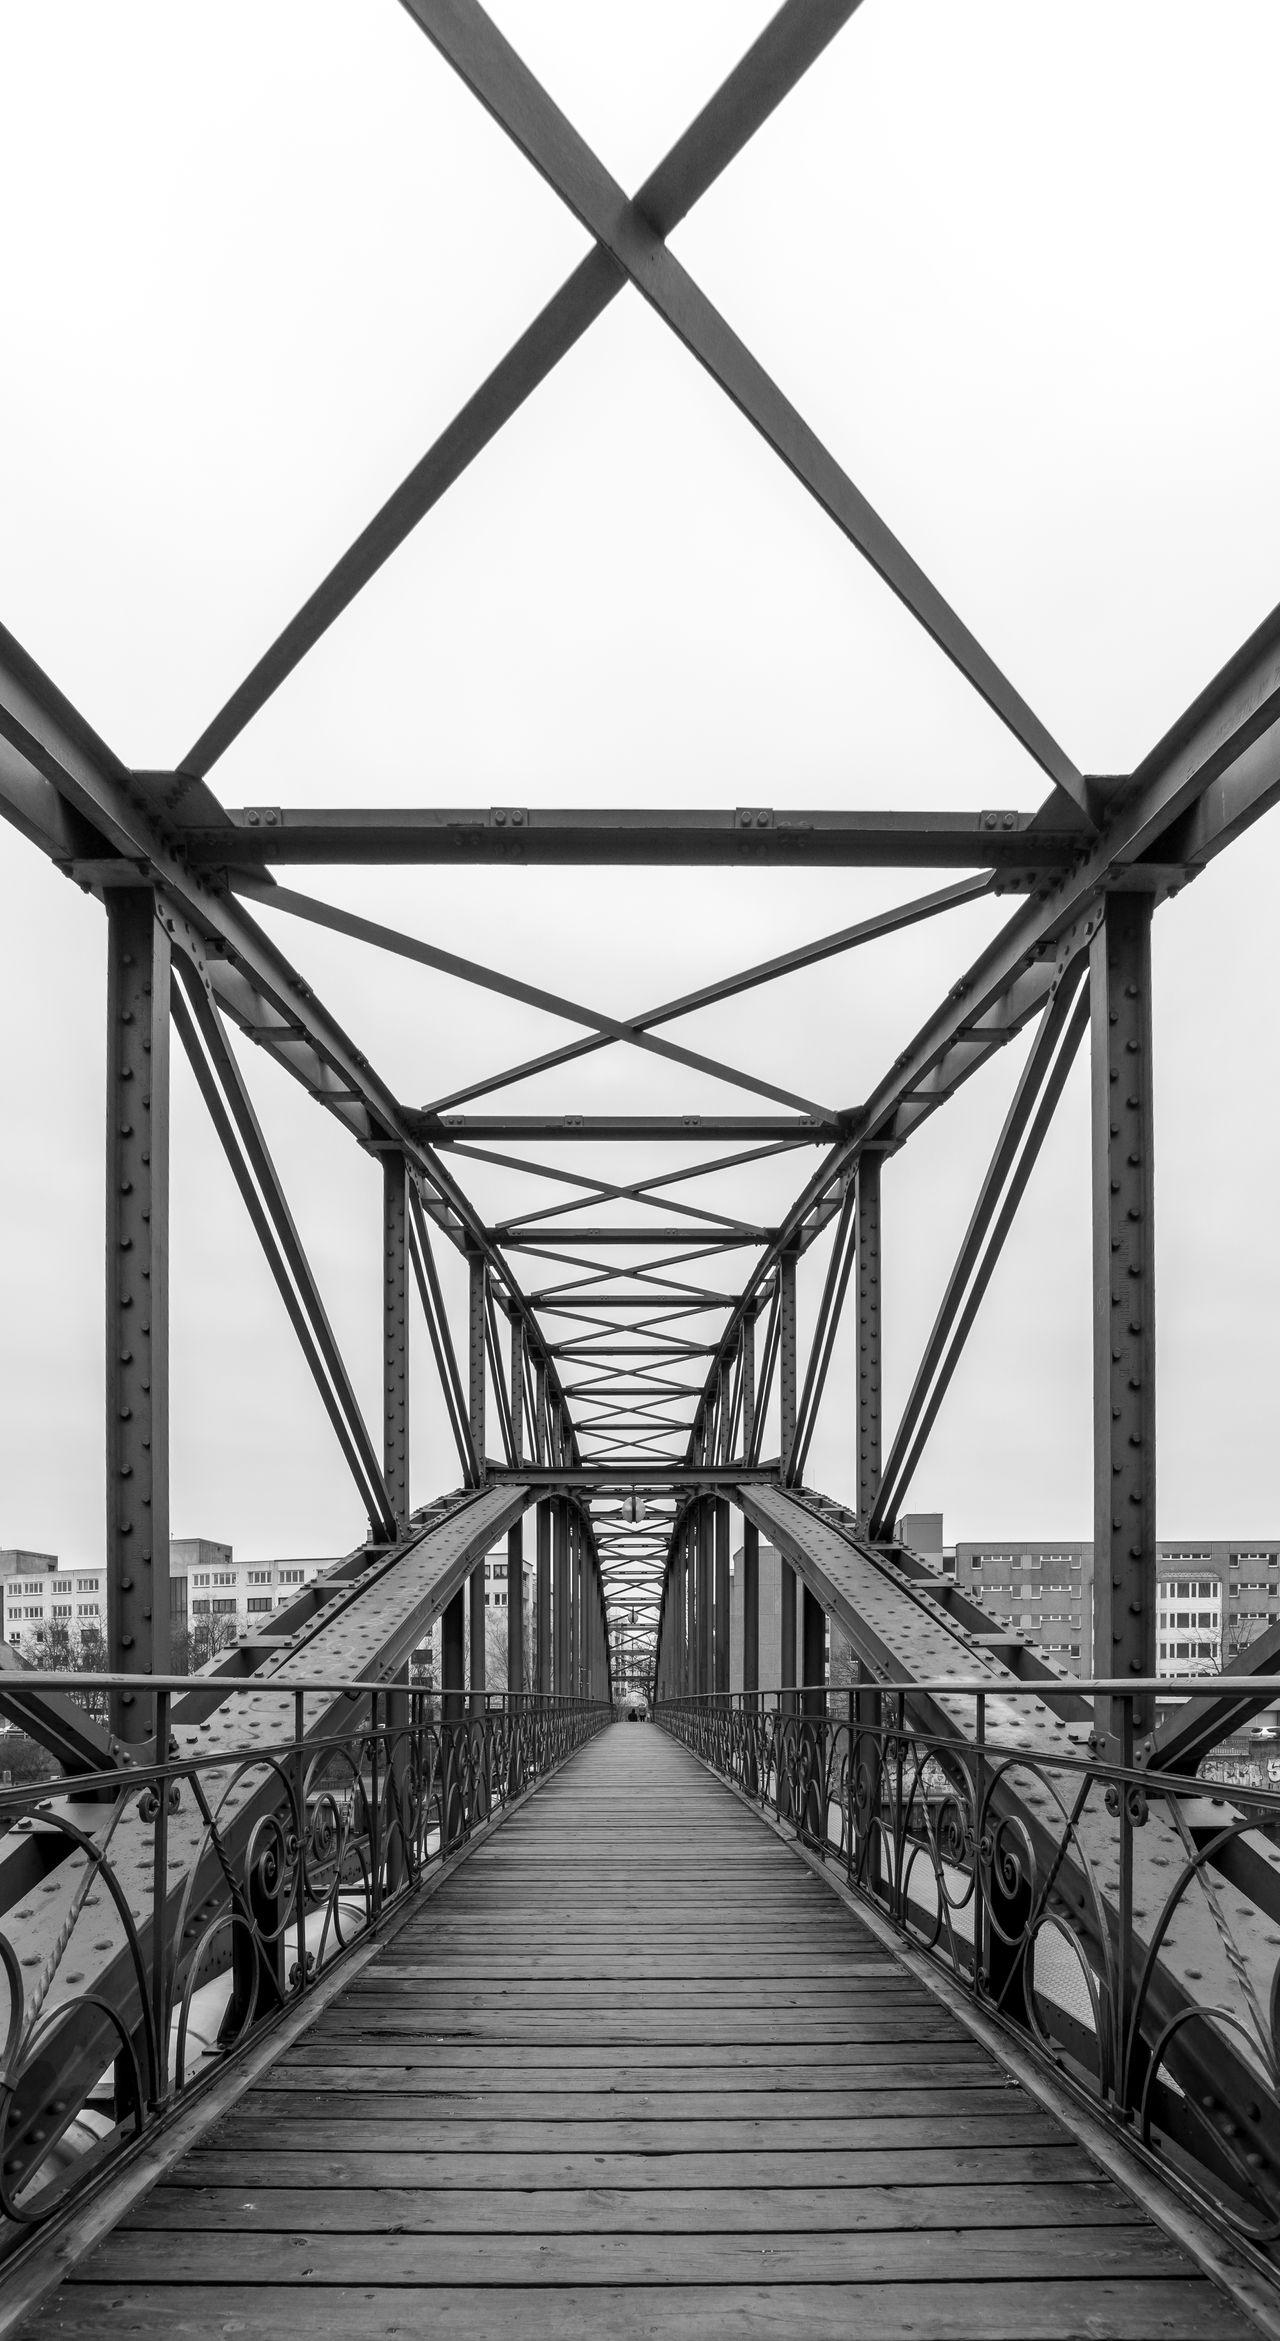 Architecture Berliner Ansichten Black & White Bridge Bridge - Man Made Structure Built Structure Connection Day Fußgängerbrücke Nature No People Outdoors Sky Suspension Bridge The Way Forward